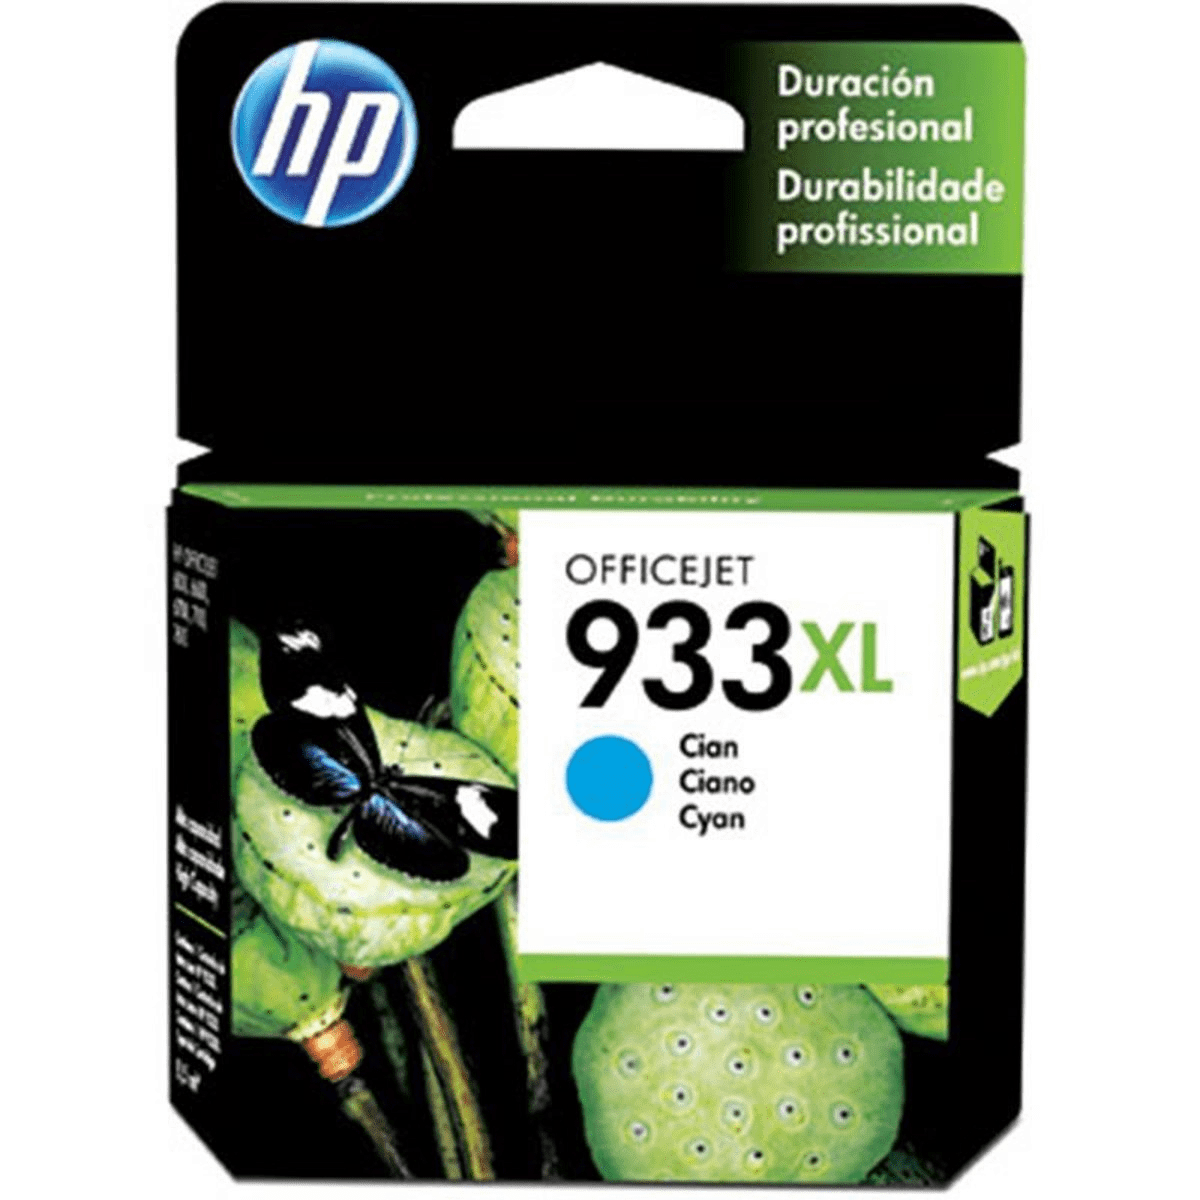 Cartucho de impressão 933XL CN054AL Ciano HP unid.